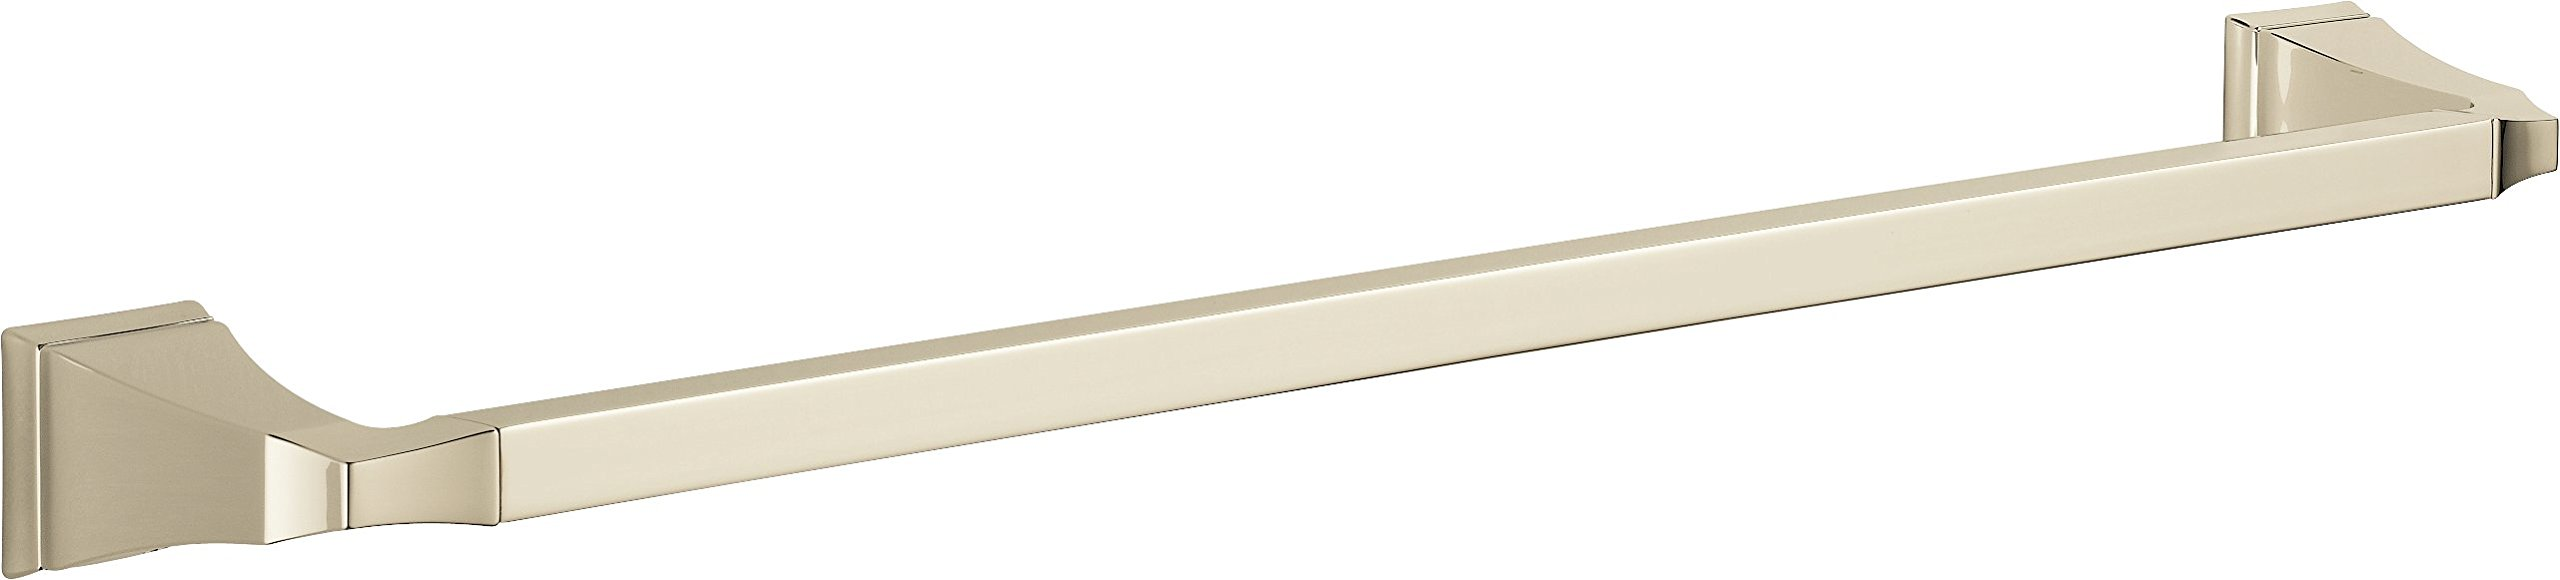 Delta Faucet 75124-PN Dryden Towel Bar, Polished Nickel by DELTA FAUCET (Image #1)